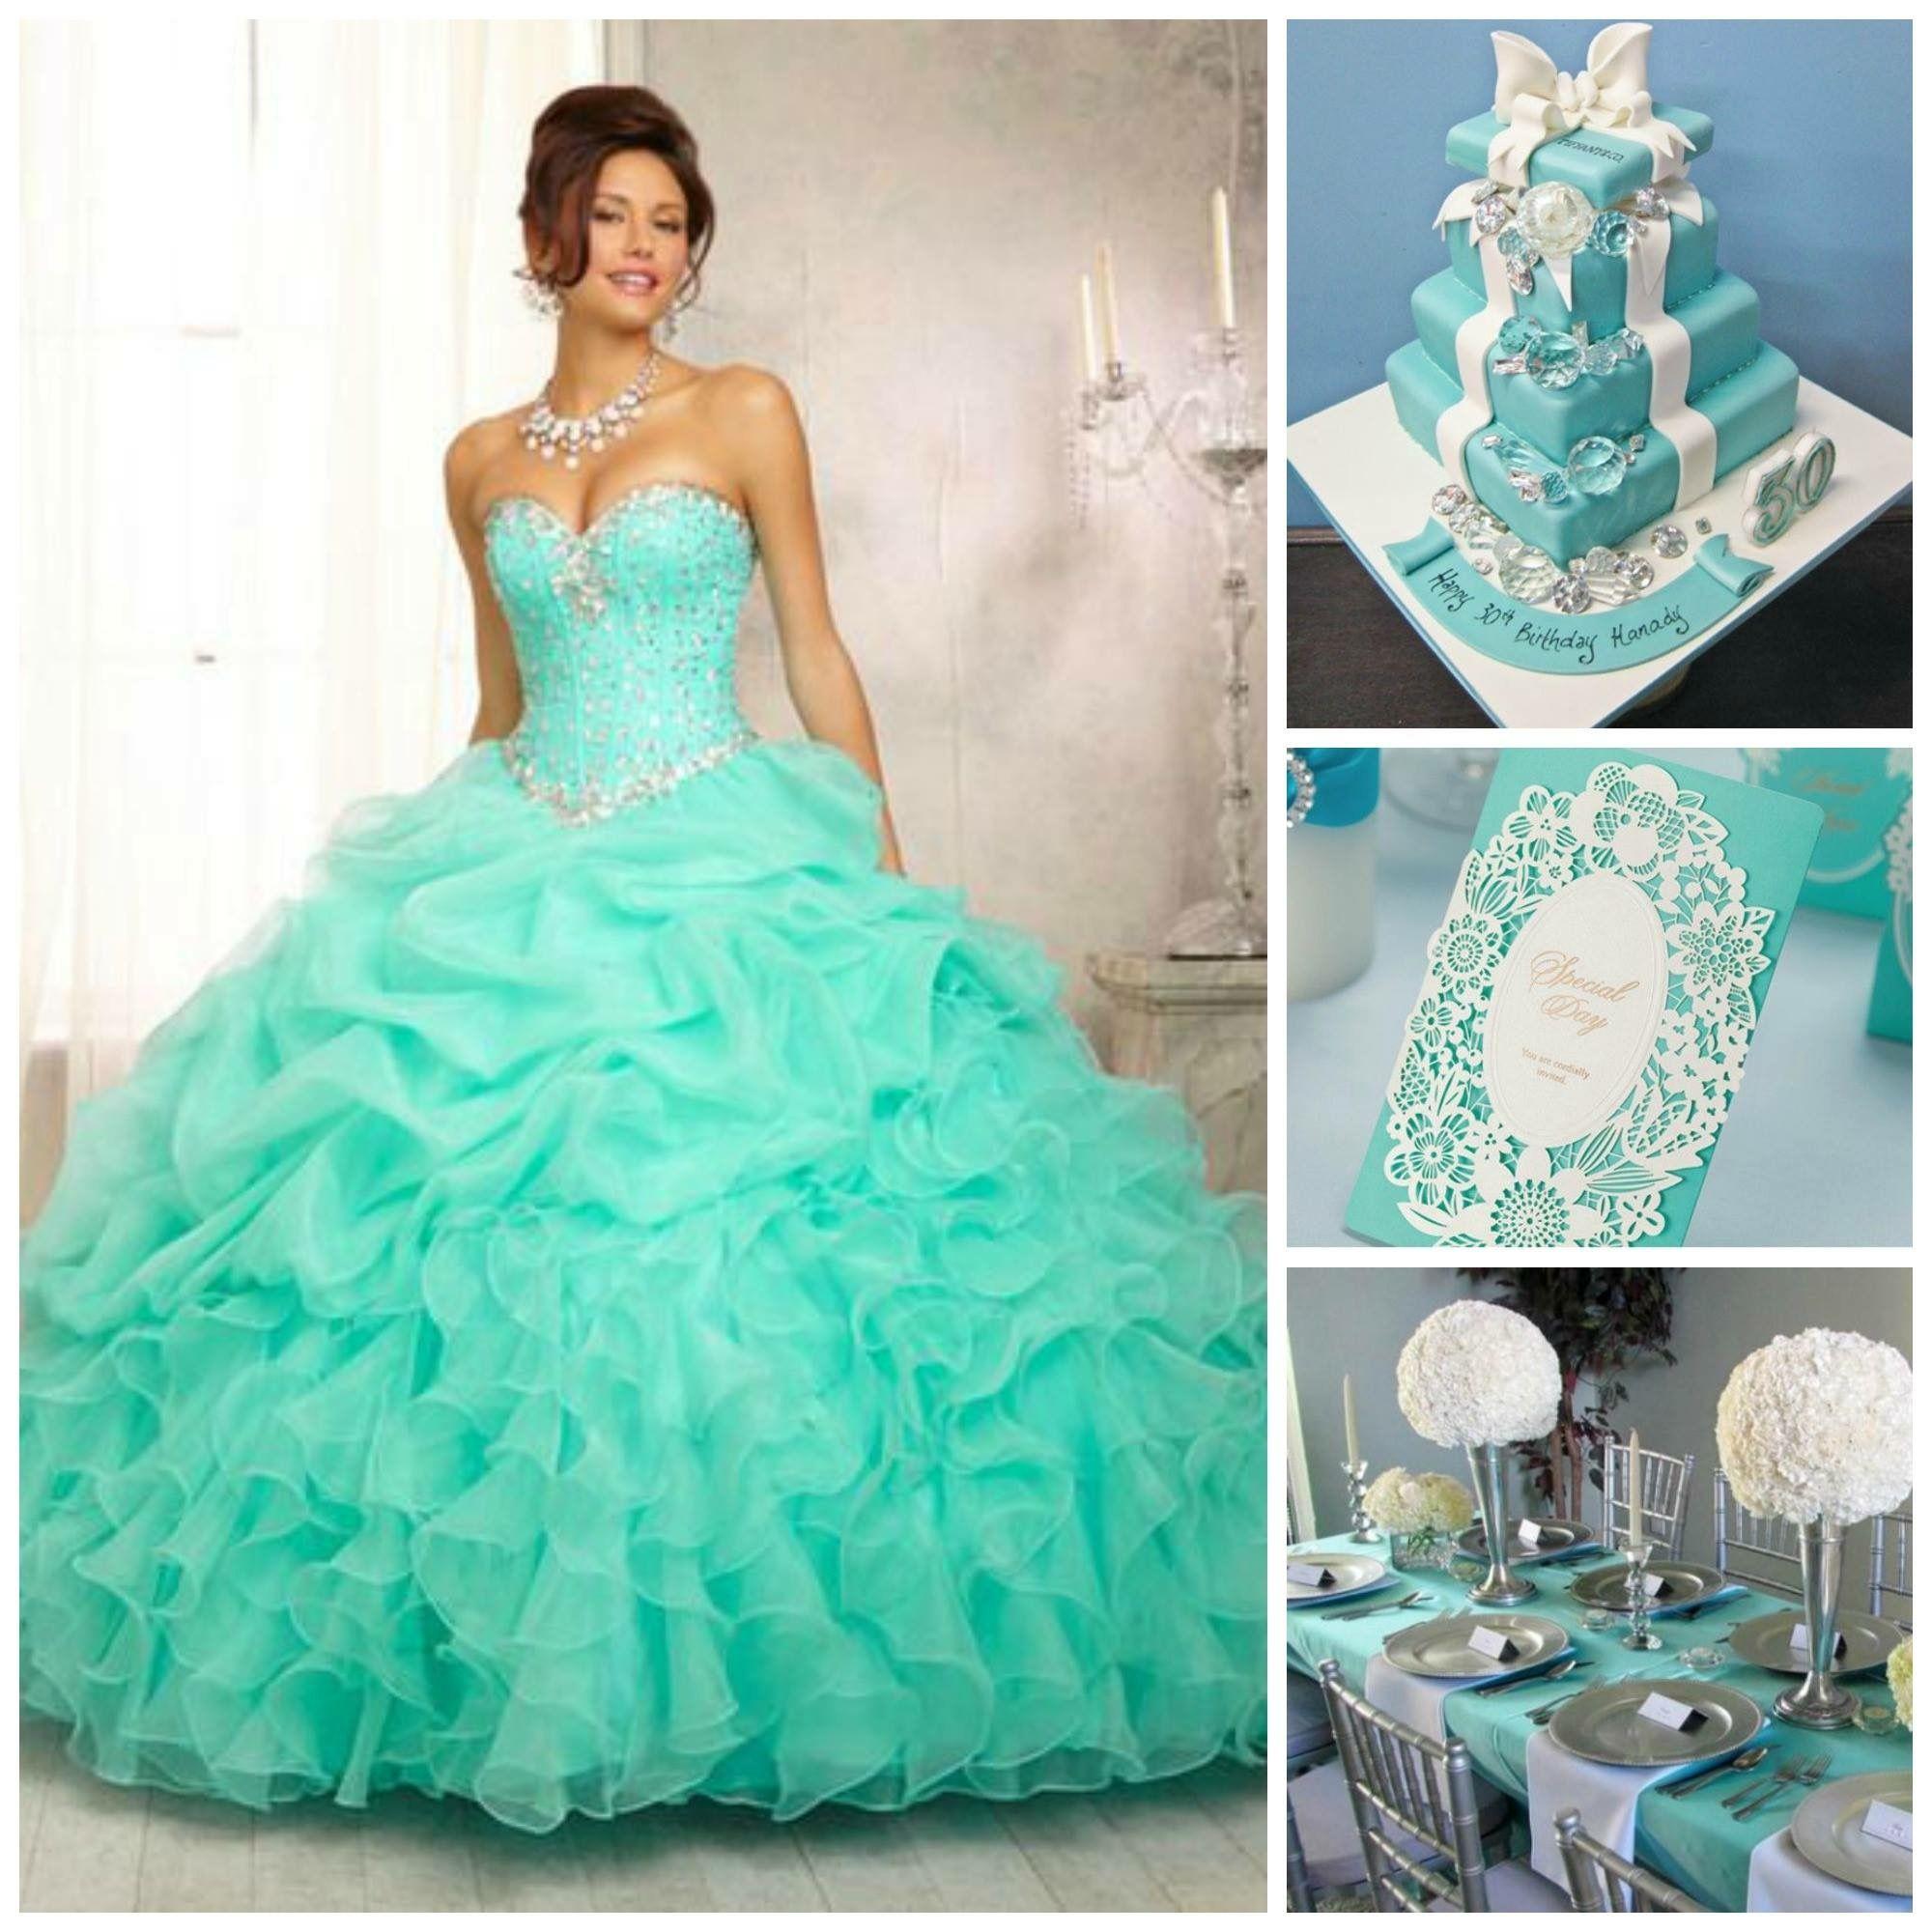 Pin by Kasandra Navarro on pretty dresses   Pinterest   Sweet 16 ...